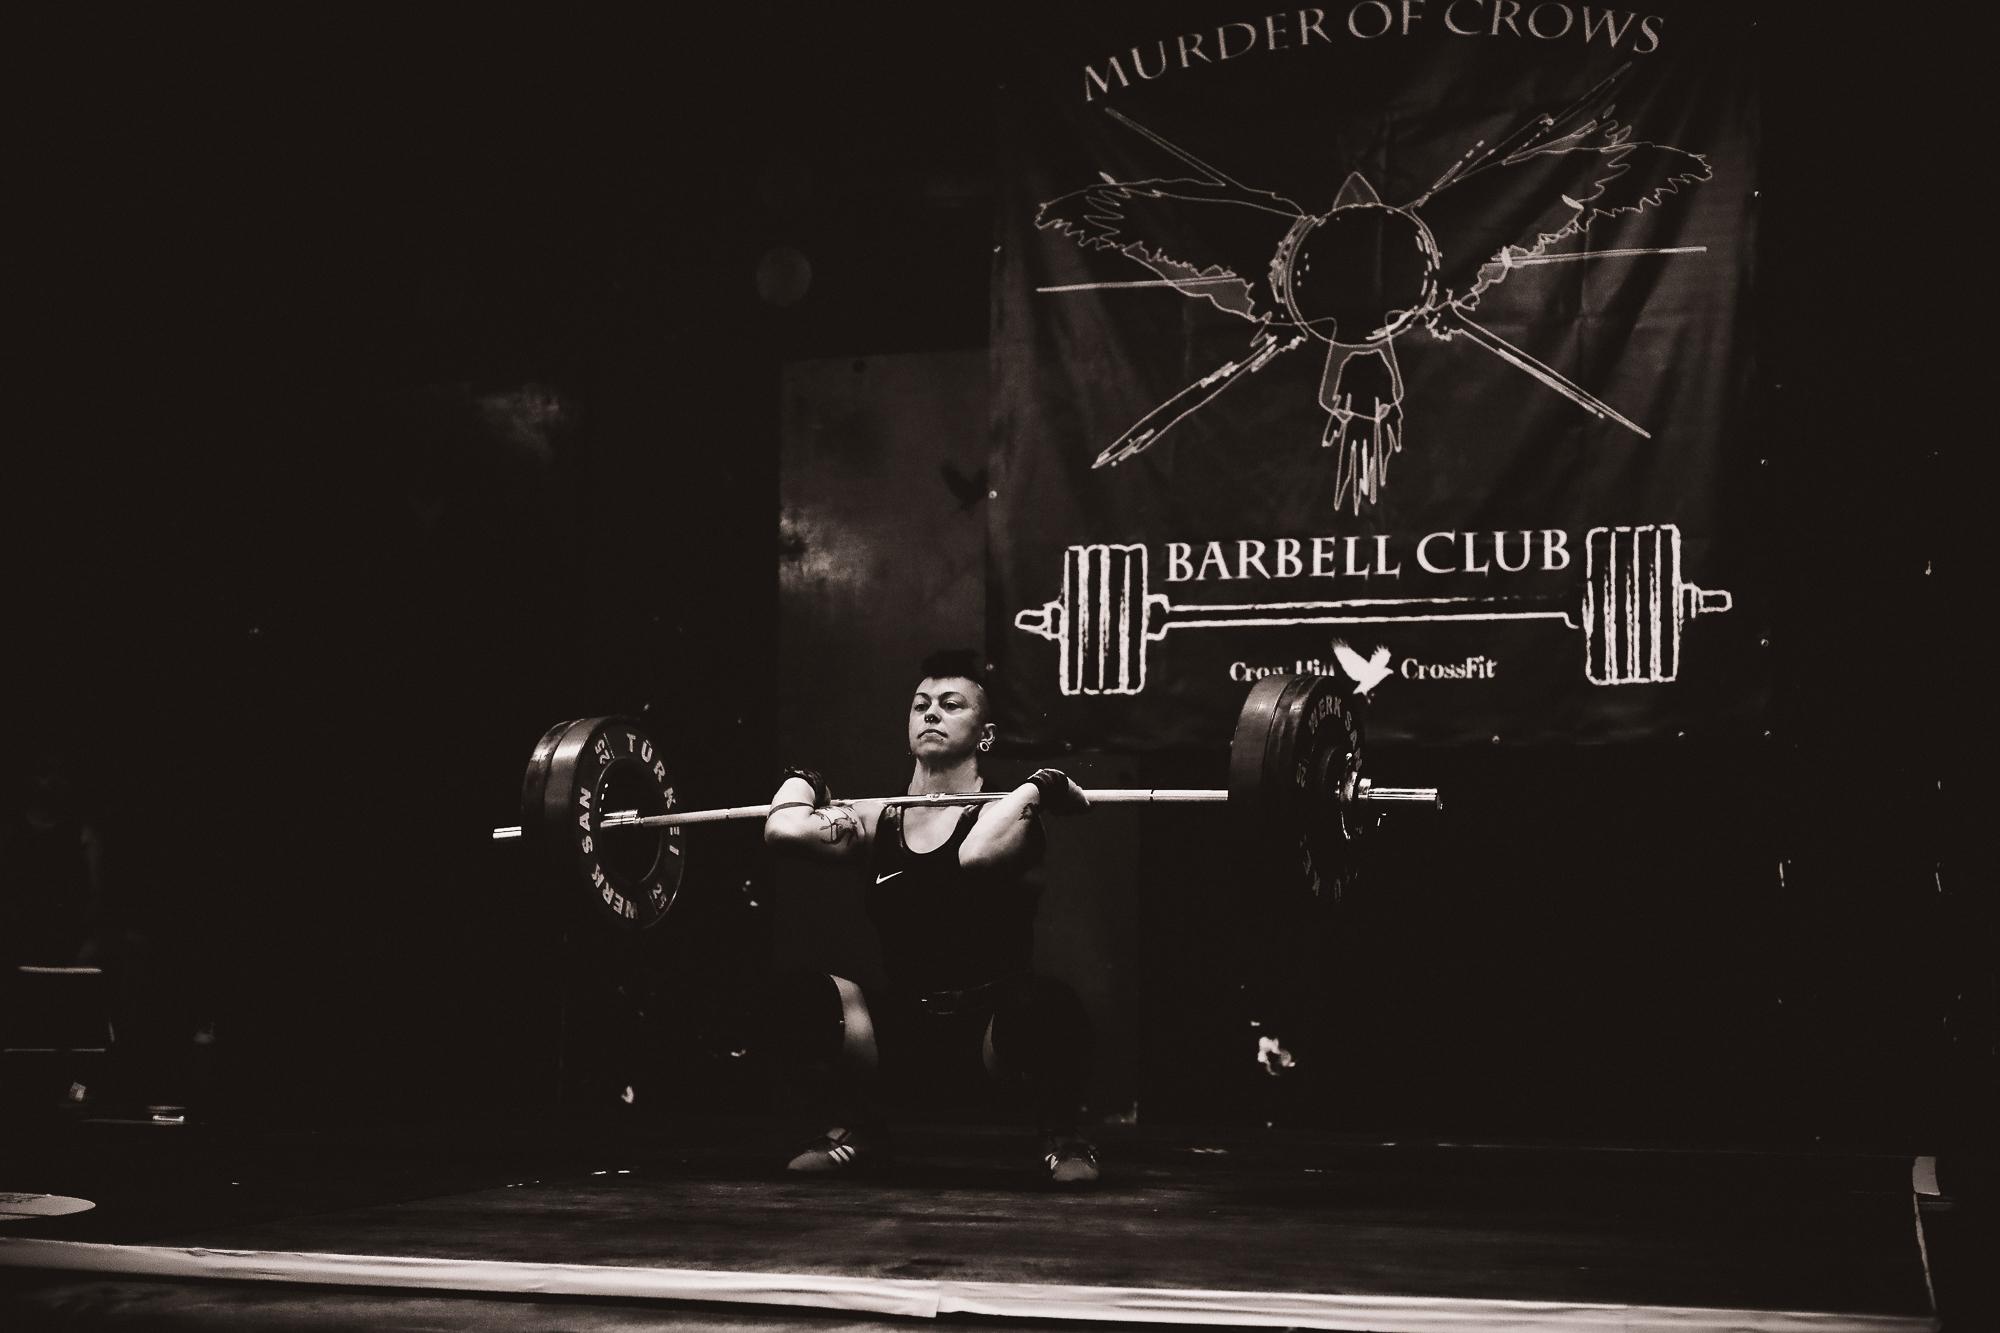 Weightlifter: Danielle